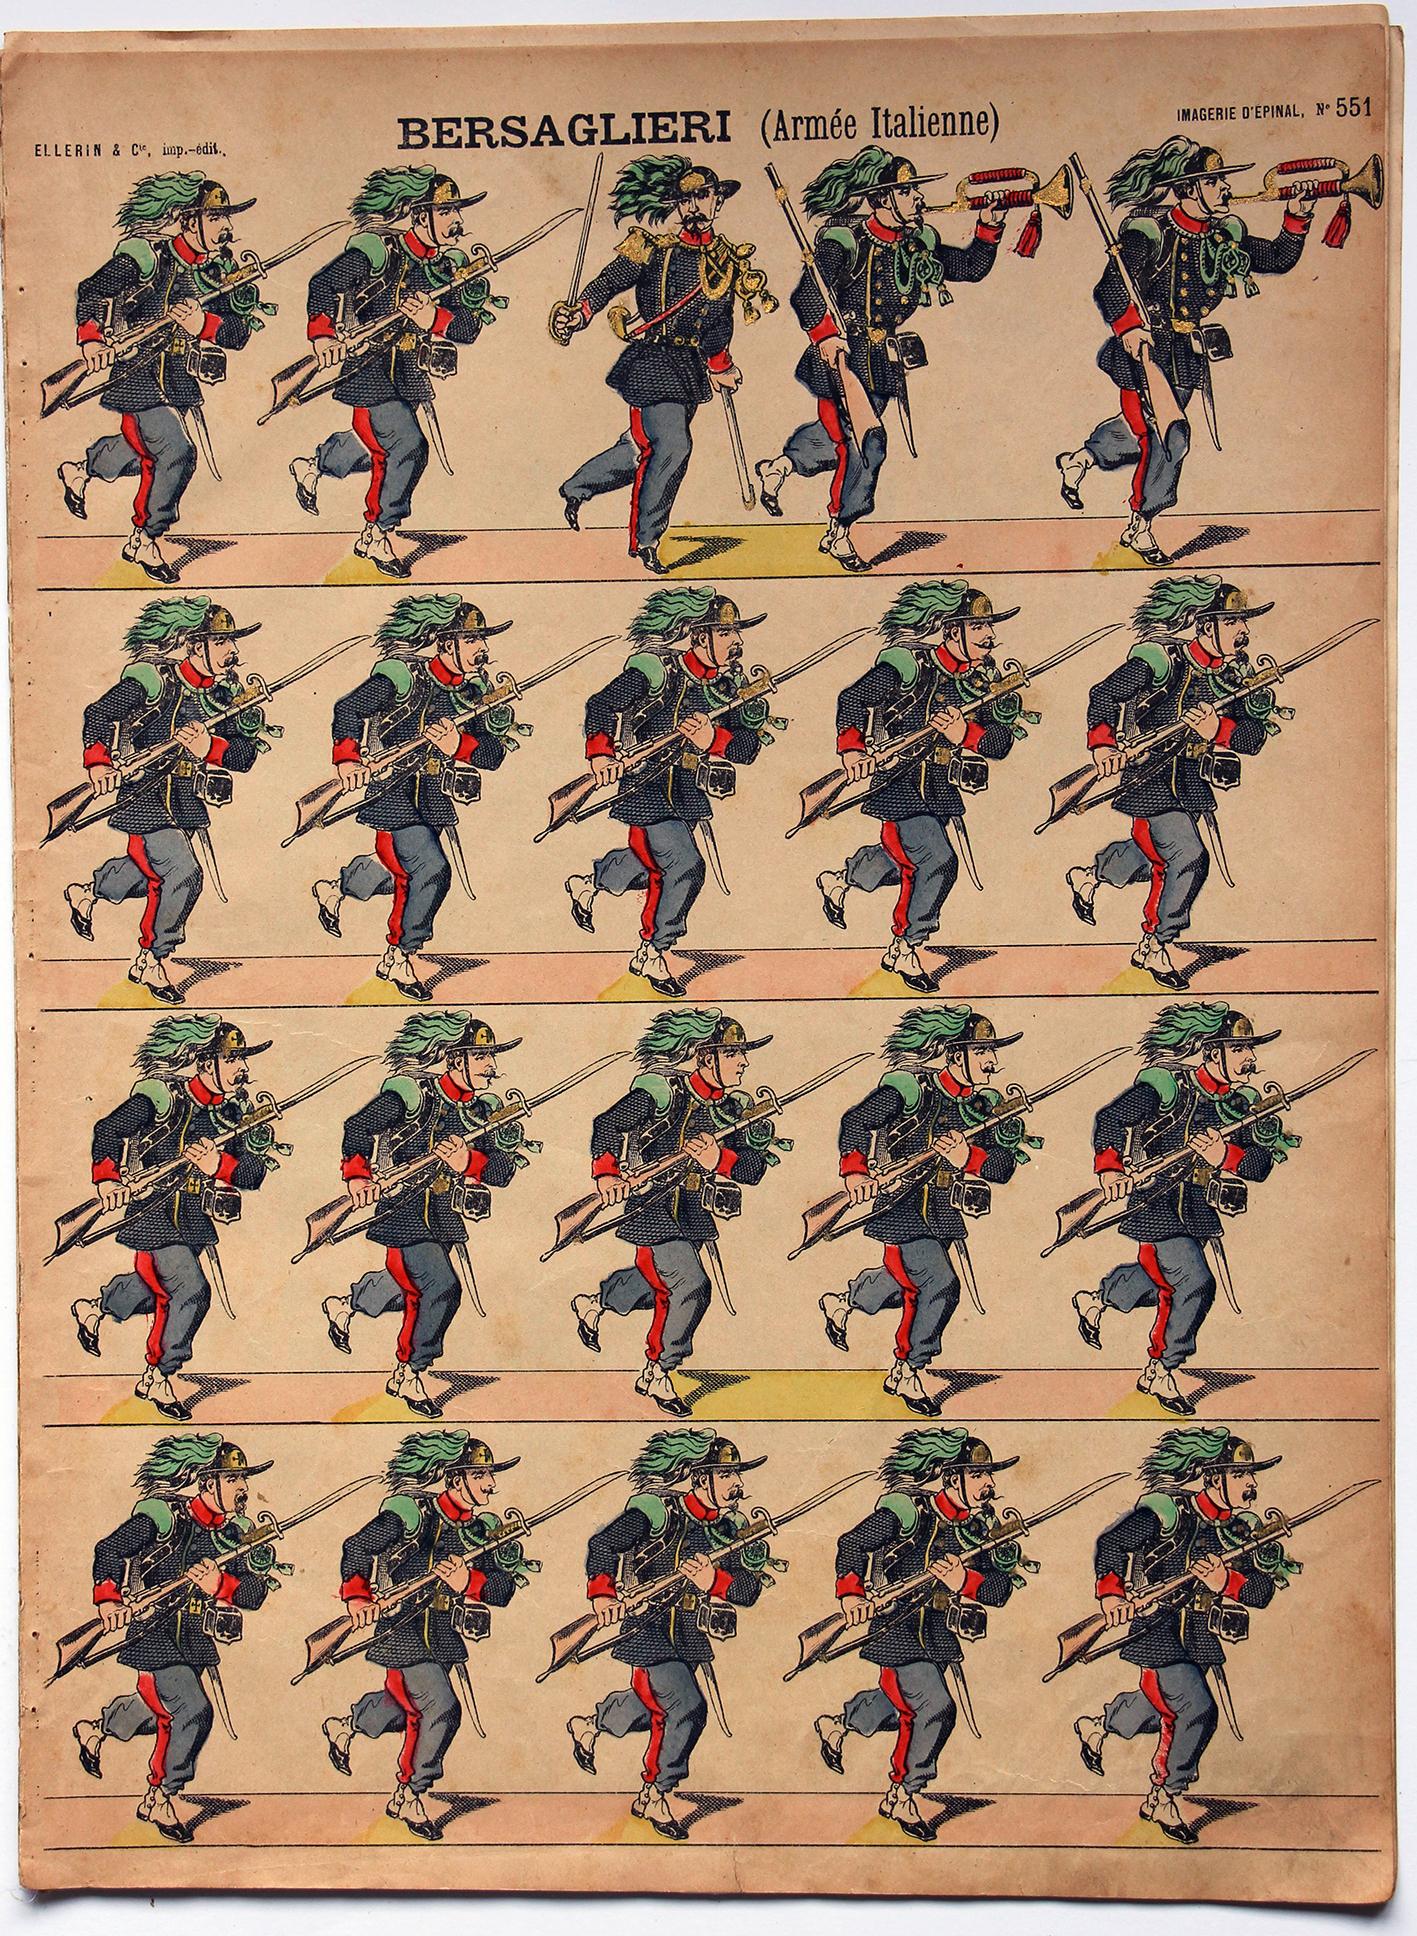 Planche imagerie Epinal - Pellerin Editeur - N°551 - Bersaglieri - Armée Italienne